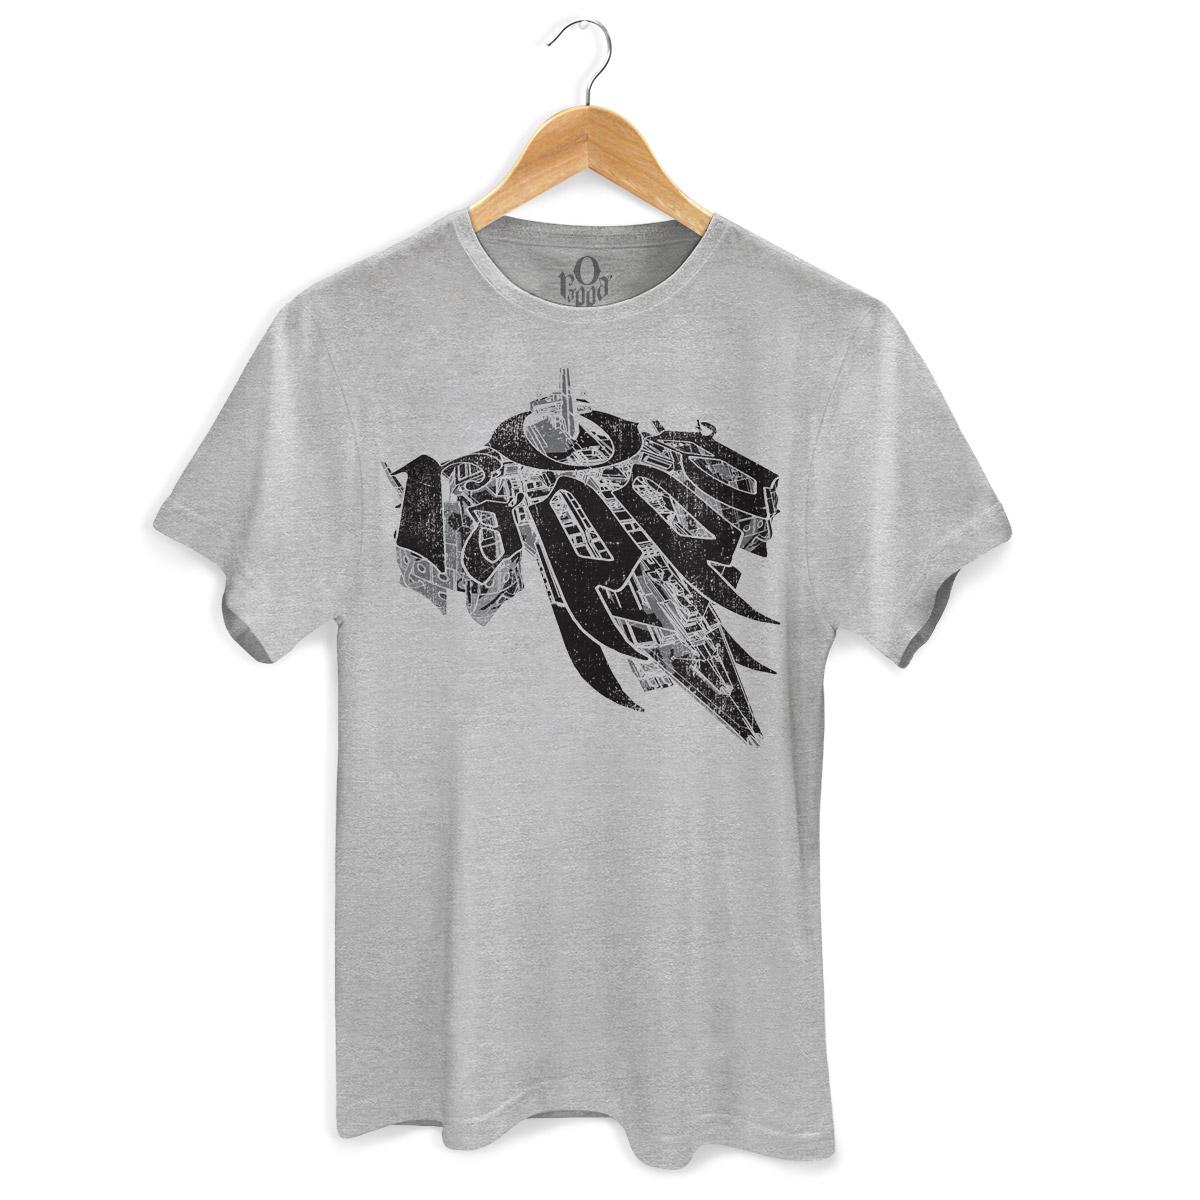 Camiseta Masculina O Rappa Nunca Tem Fim